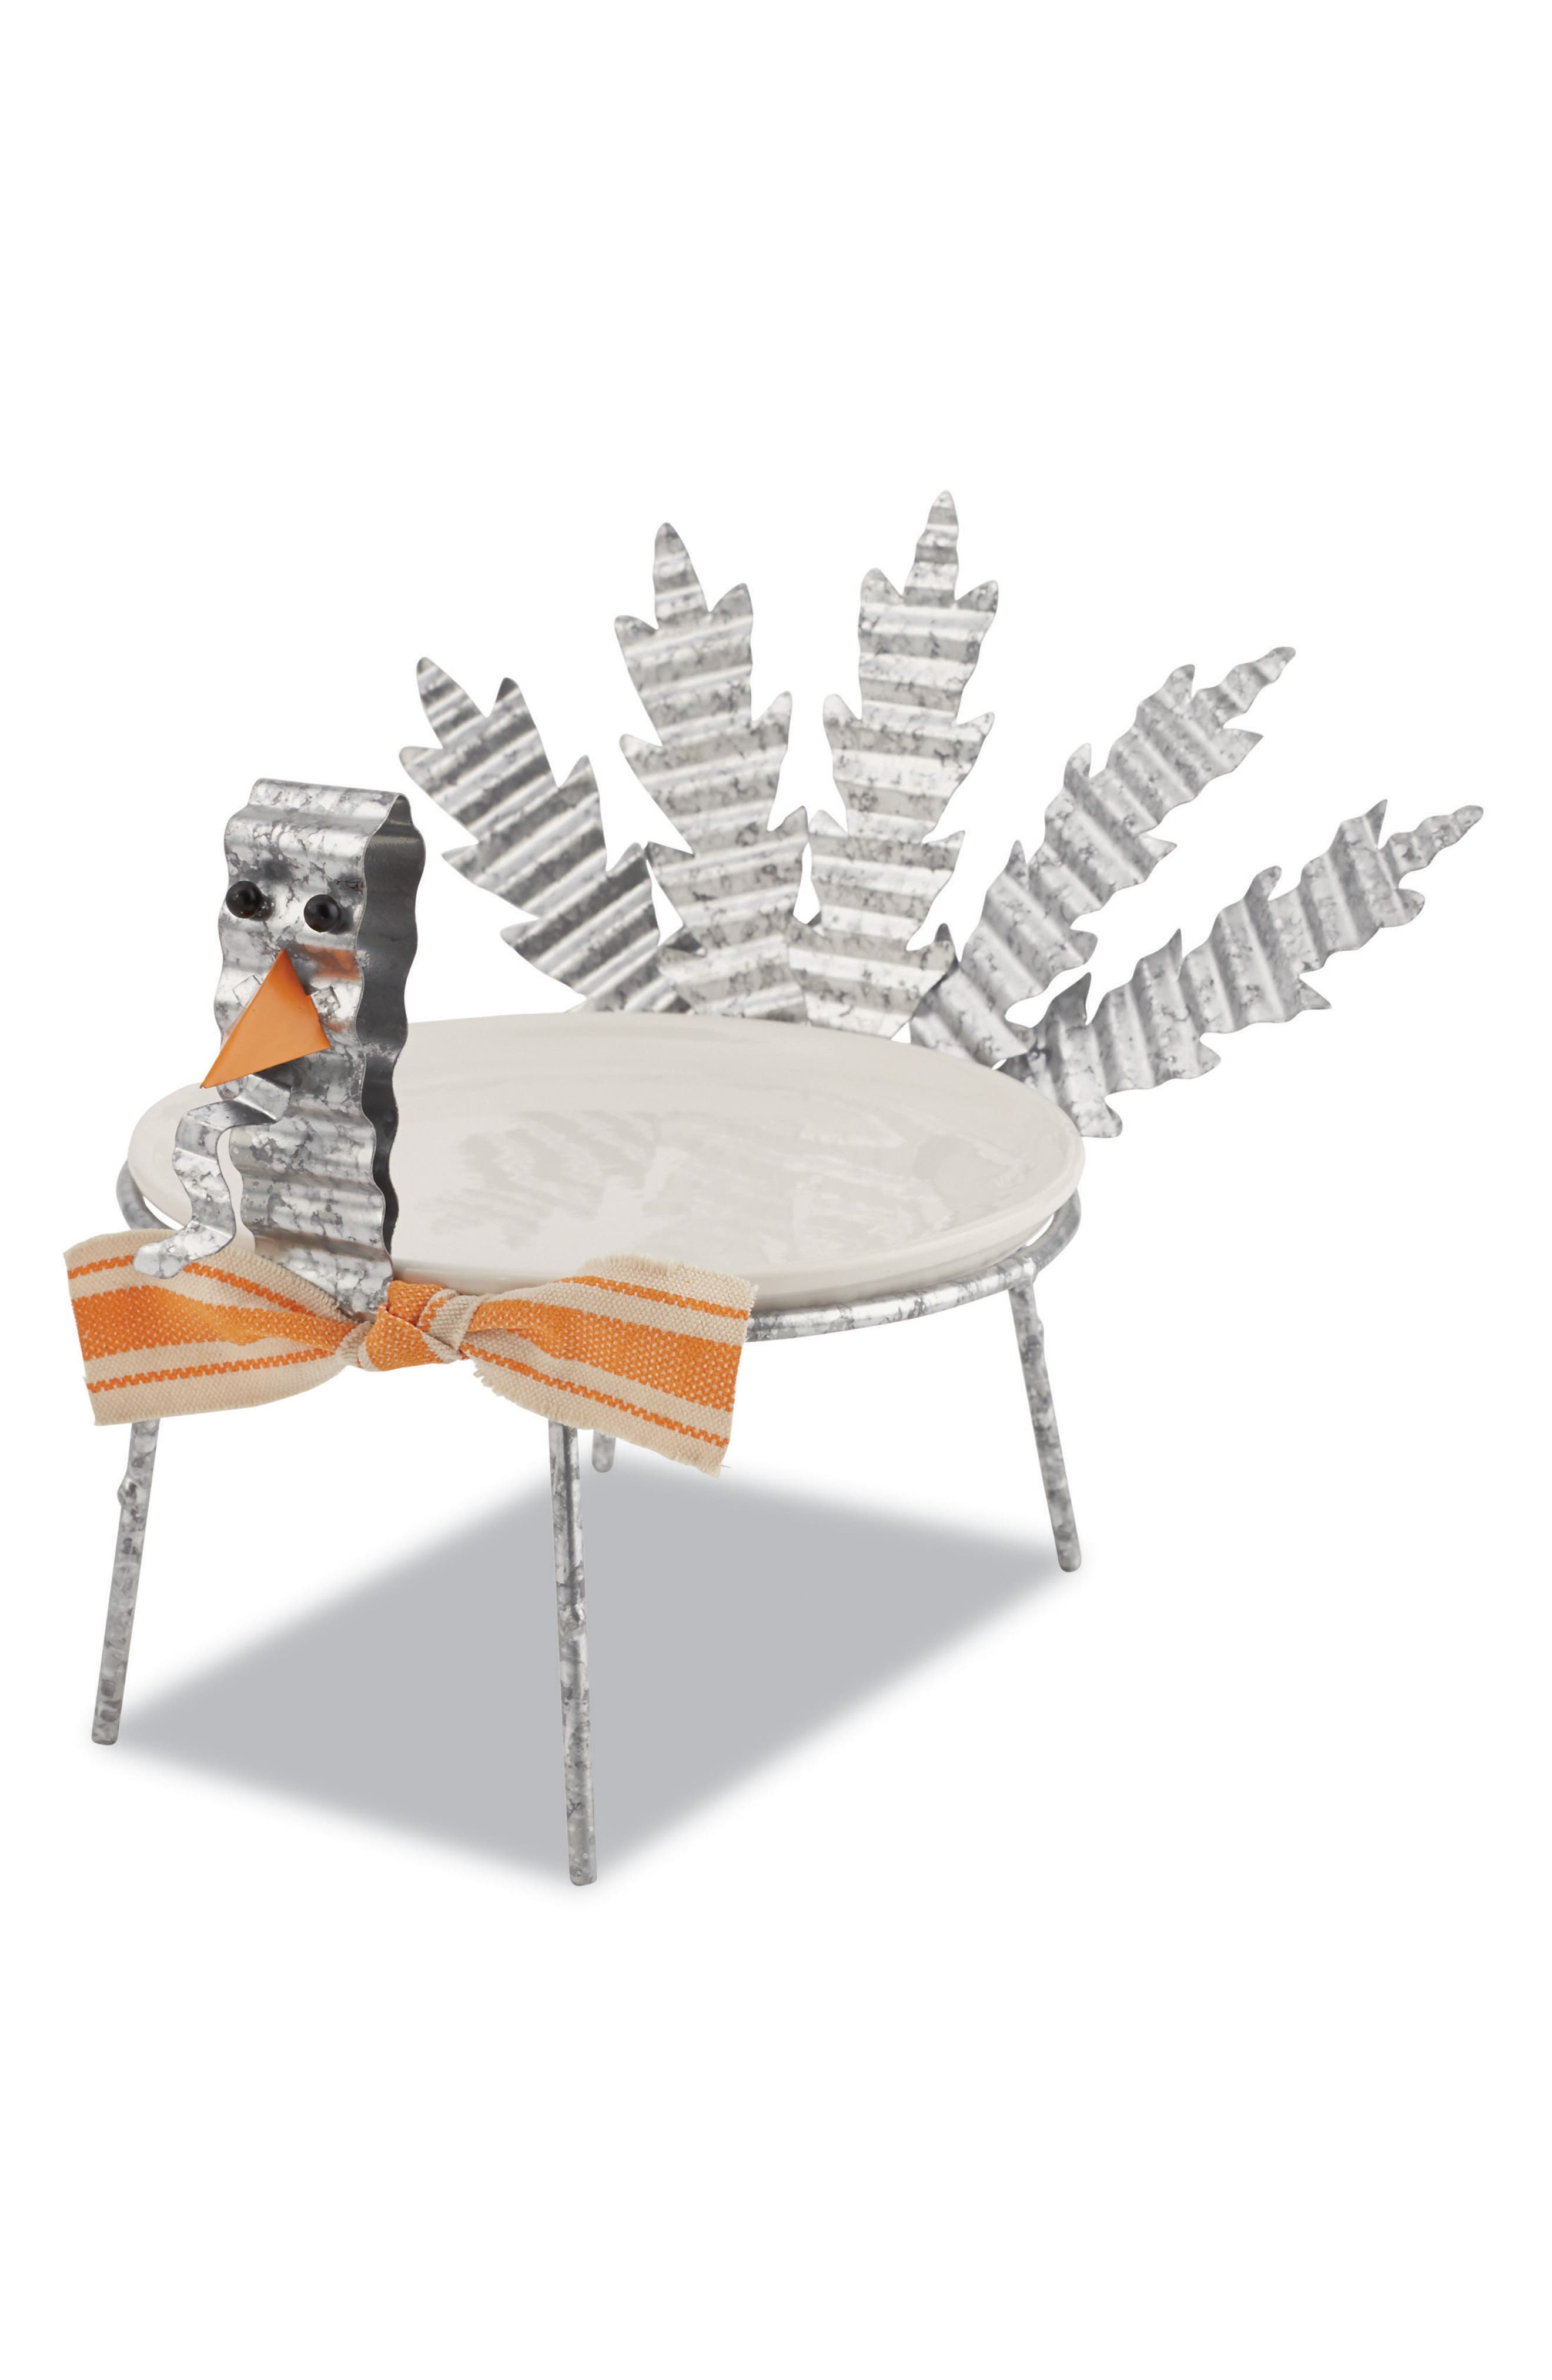 Alternate Image 1 Selected - Mud Pie Turkey Plate & Stand Set